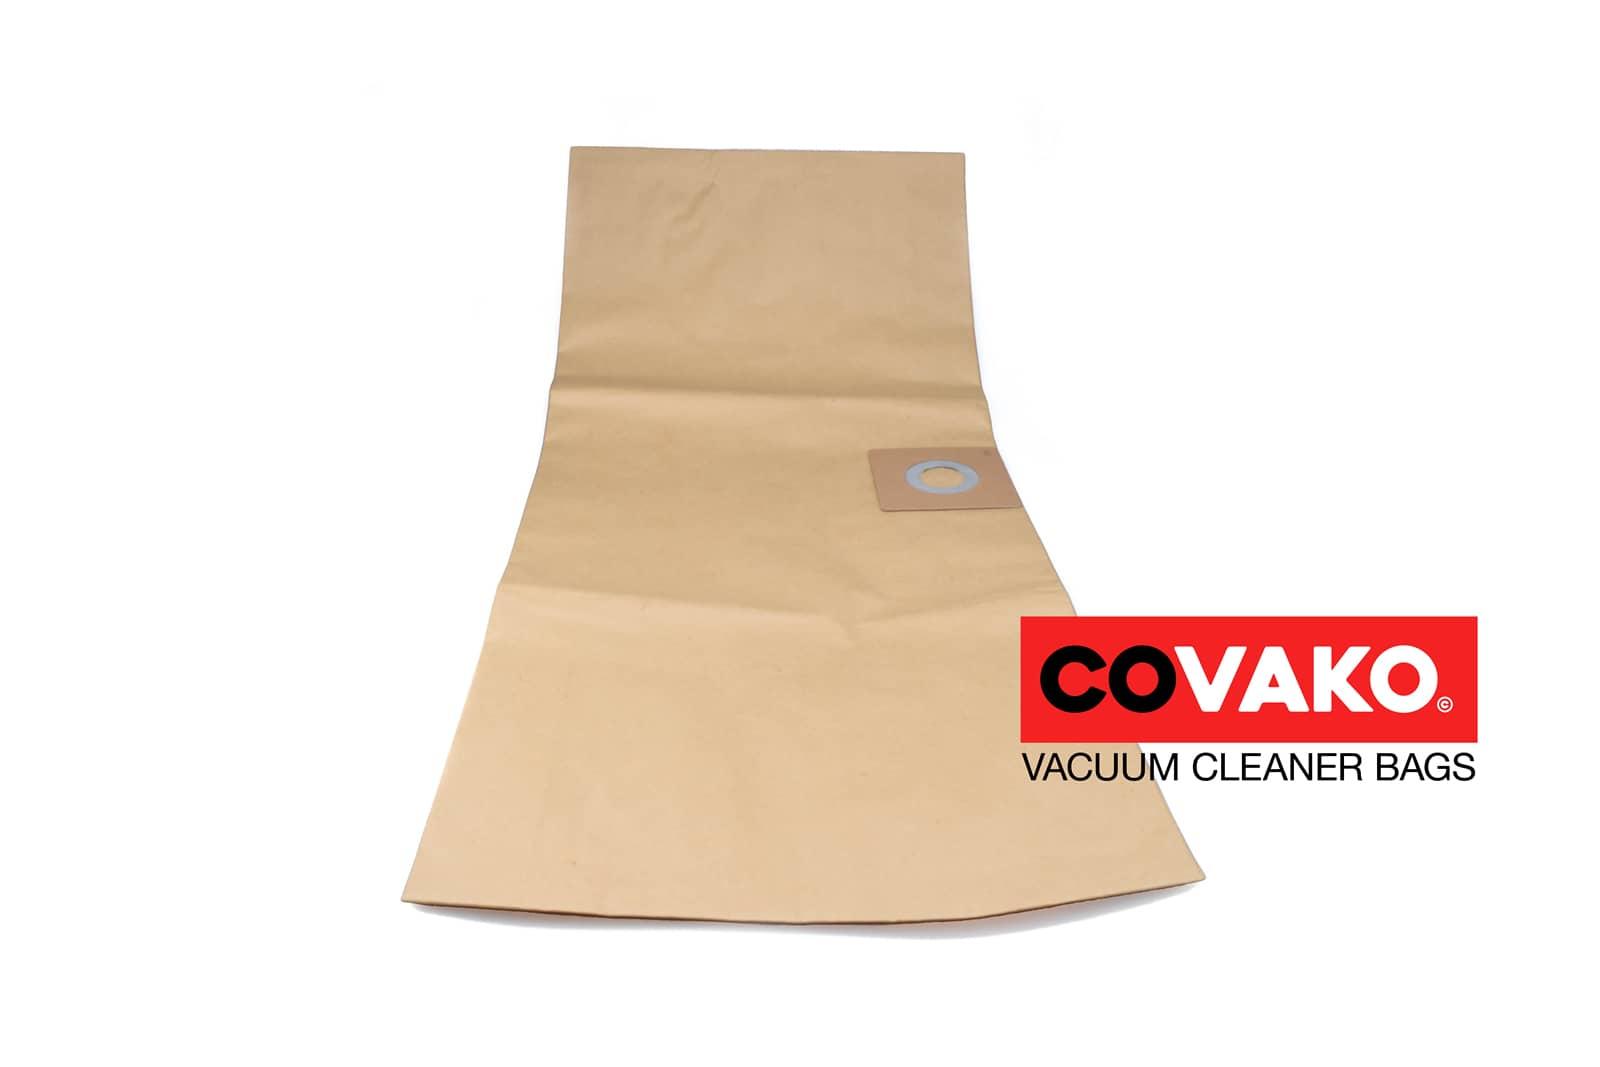 Kärcher NT 700 / Papier - Kärcher sacs d'aspirateur